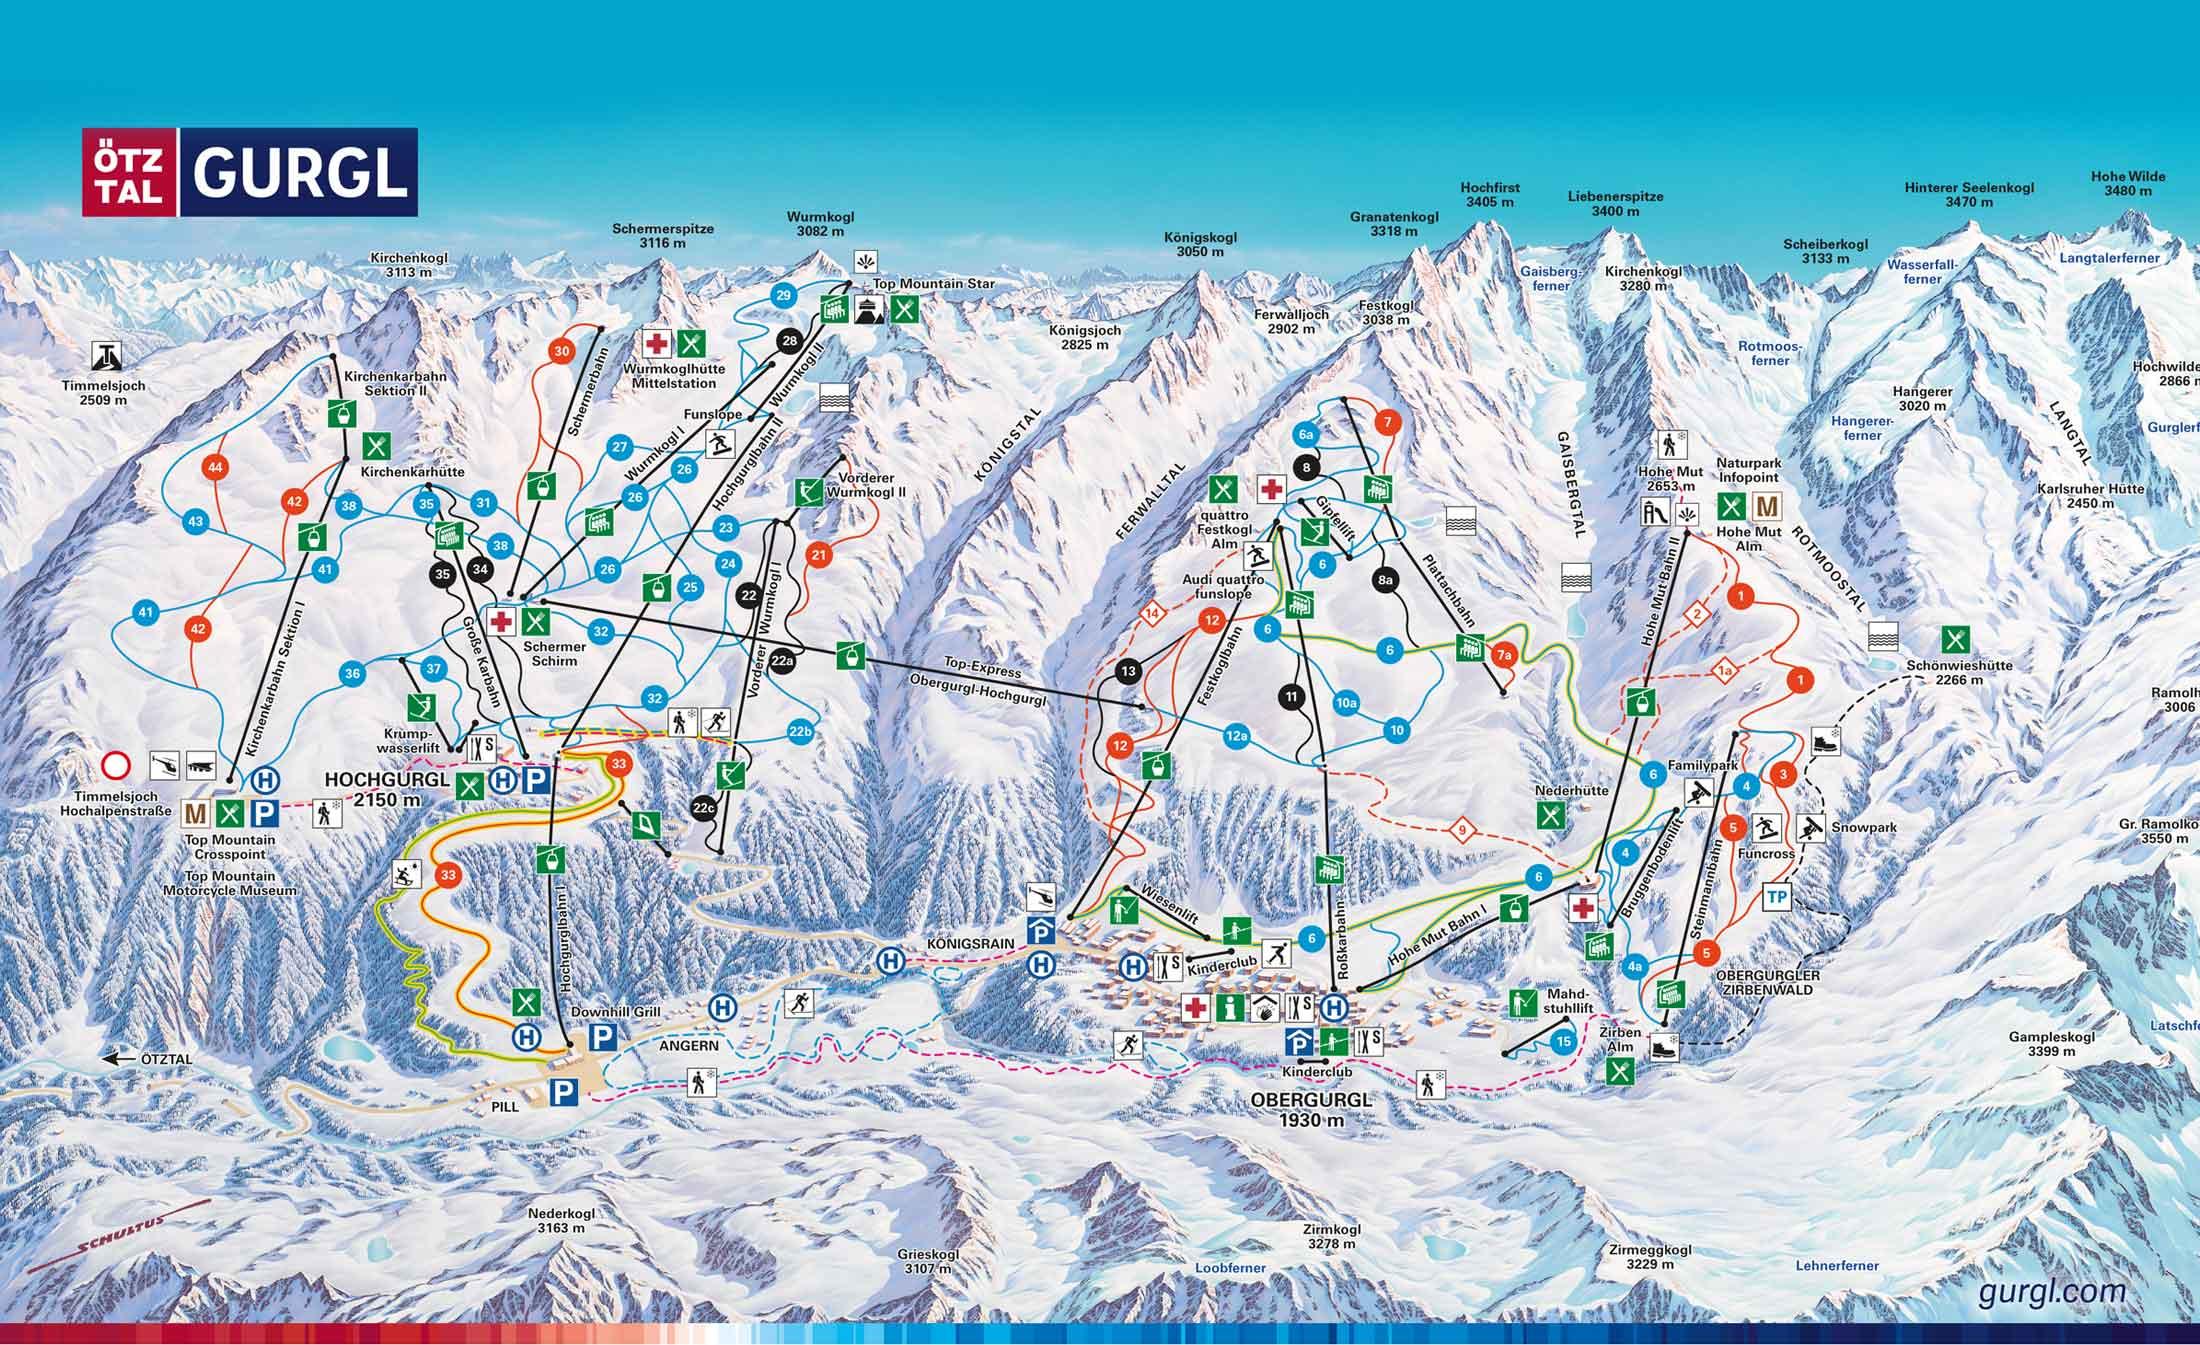 Skigebiete-obergurgl-Hochgurgl